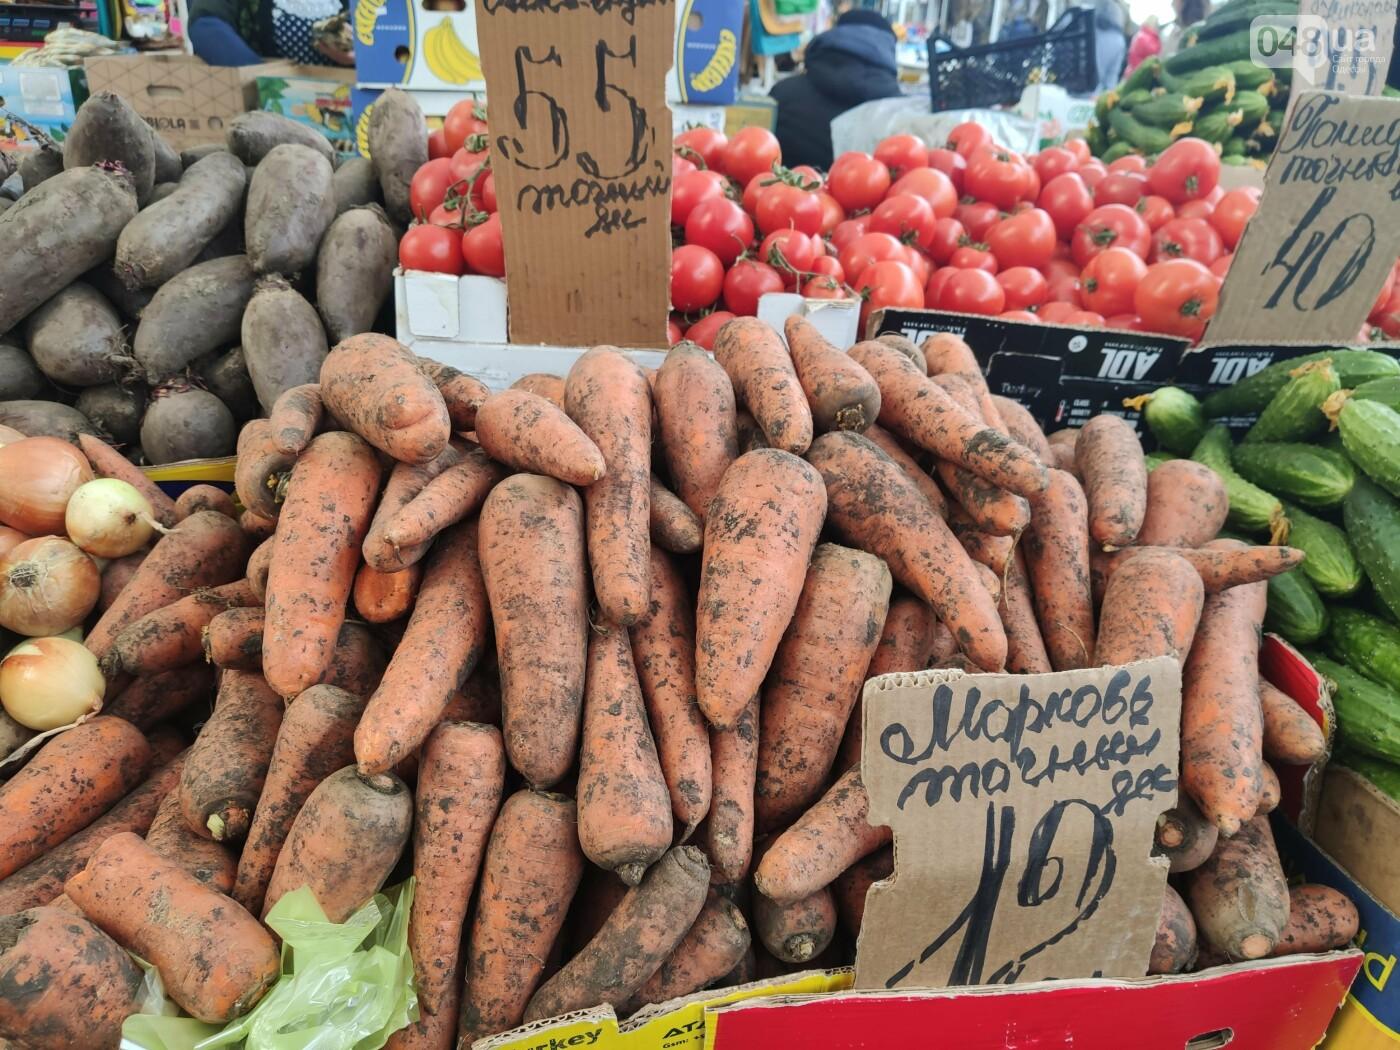 Топинамбур, помело, редис: почем на одесском Привозе фрукты и овощи, - ФОТО, фото-2